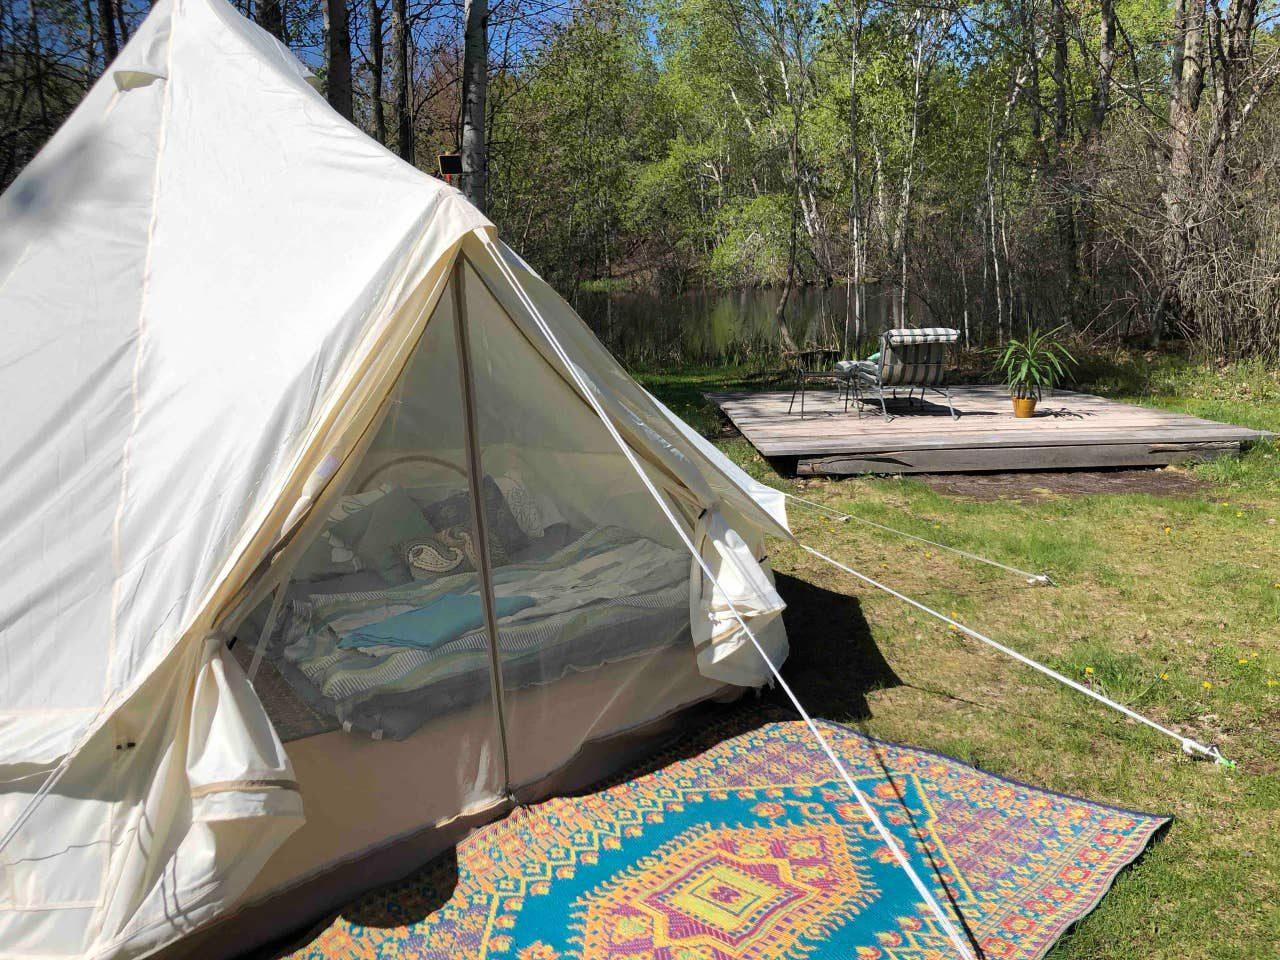 Sunrise Yurt Tent at Rocky Top